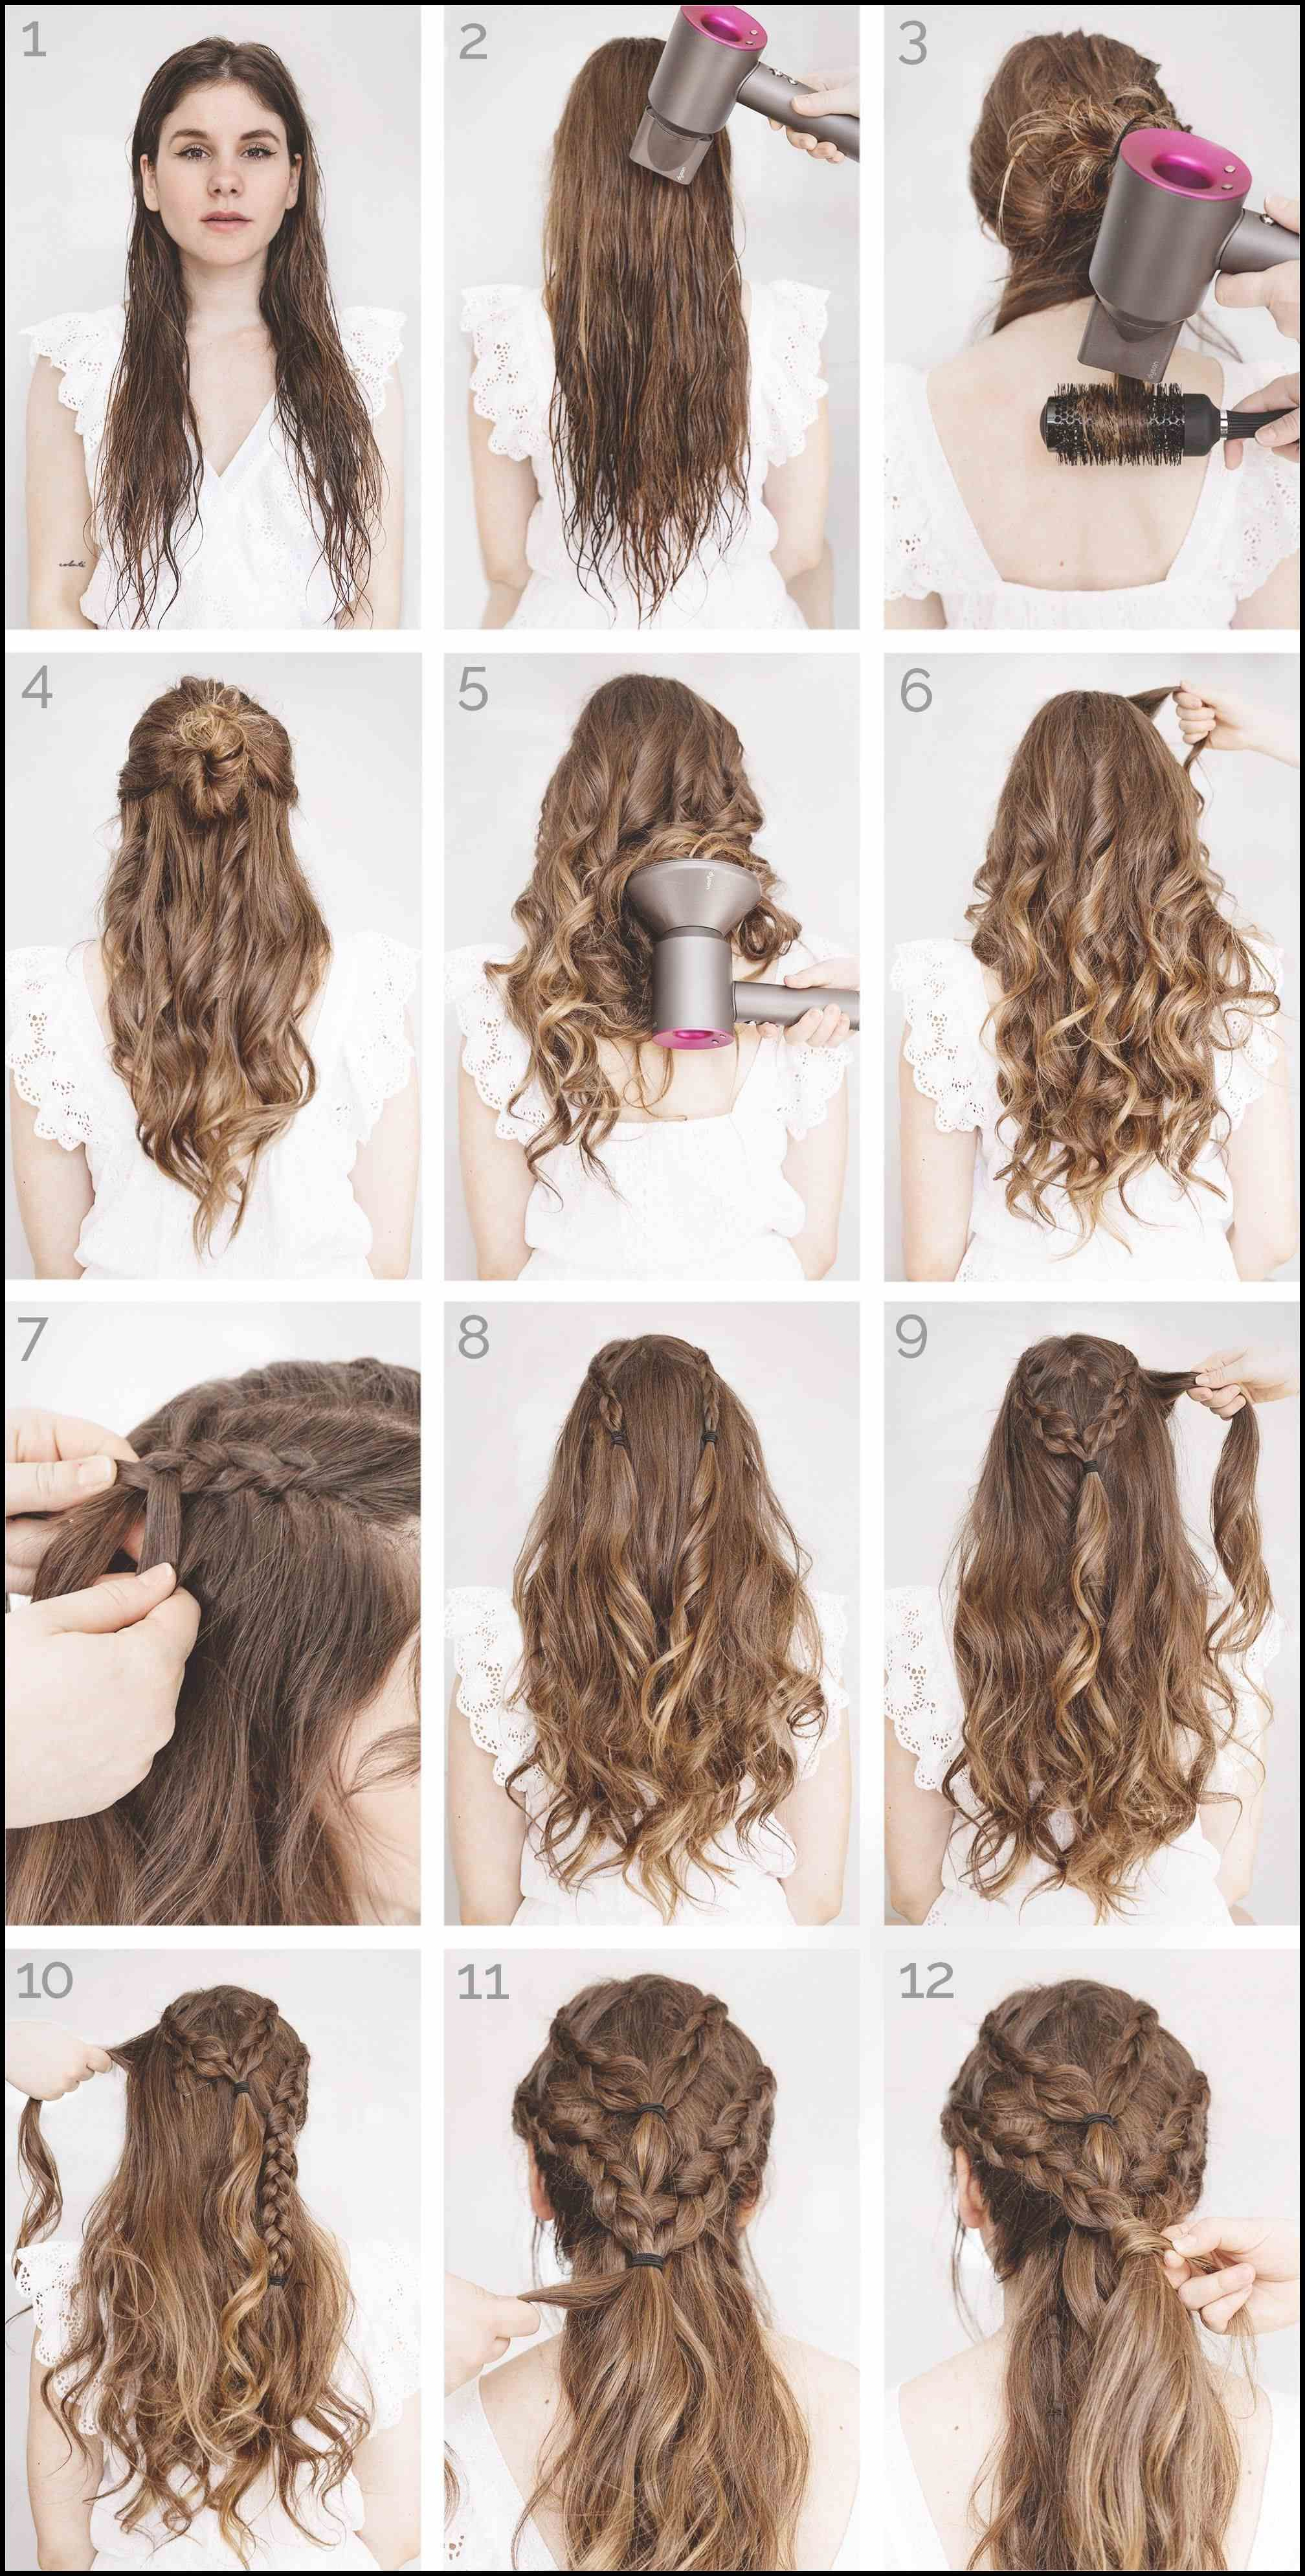 Schönes Frisuren-Tutorial #zöpfe #langehaare #naturlocken